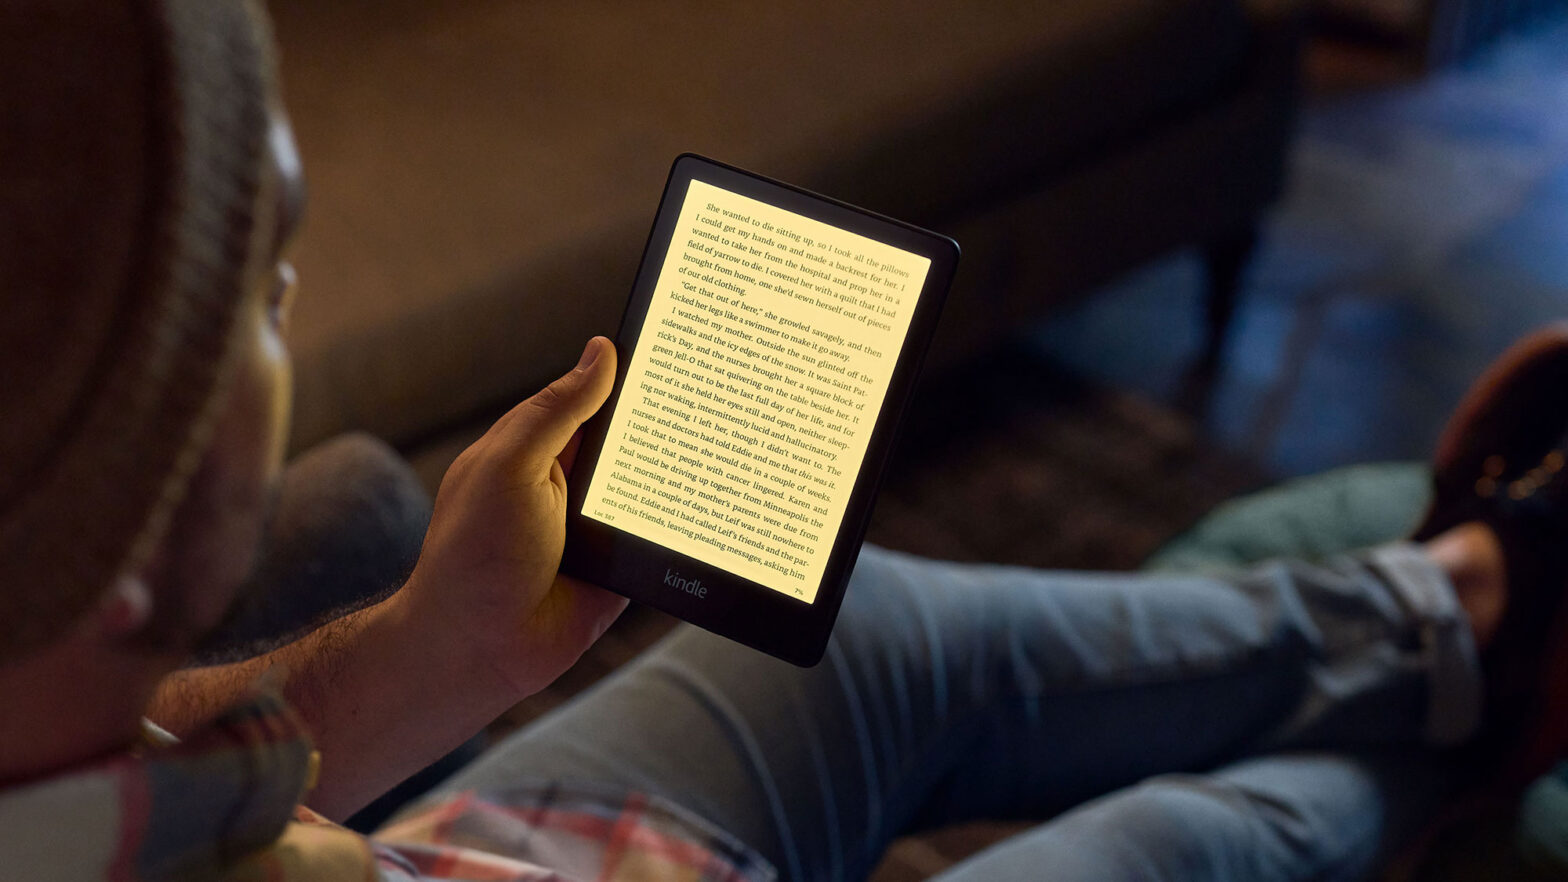 2021 Amazon Kindle Paperwhite eReader Tablets